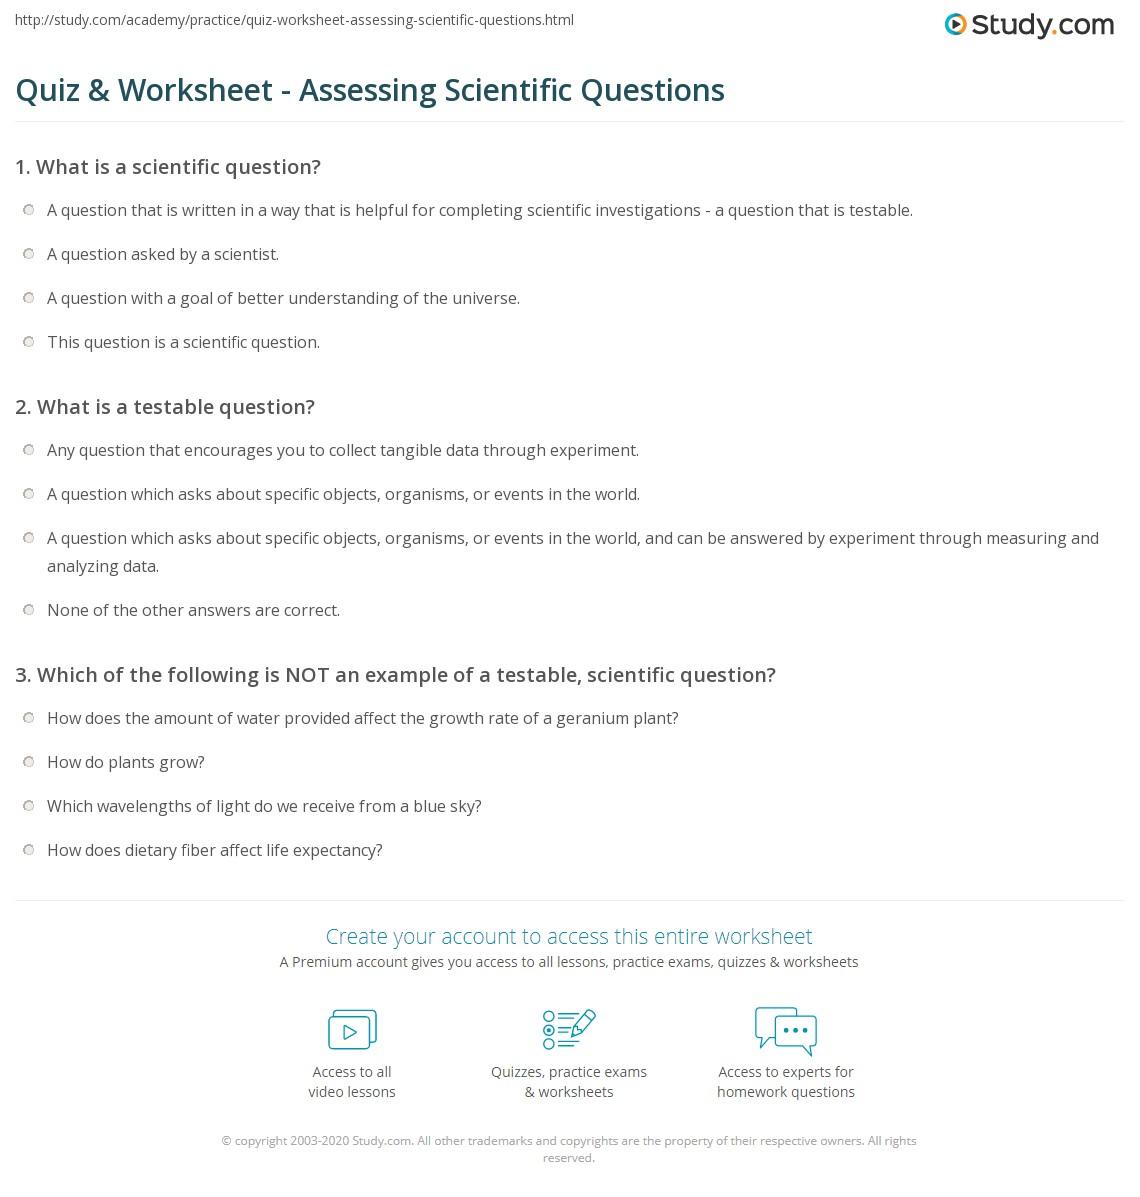 Quiz & Worksheet - Assessing Scientific Questions | Study.com